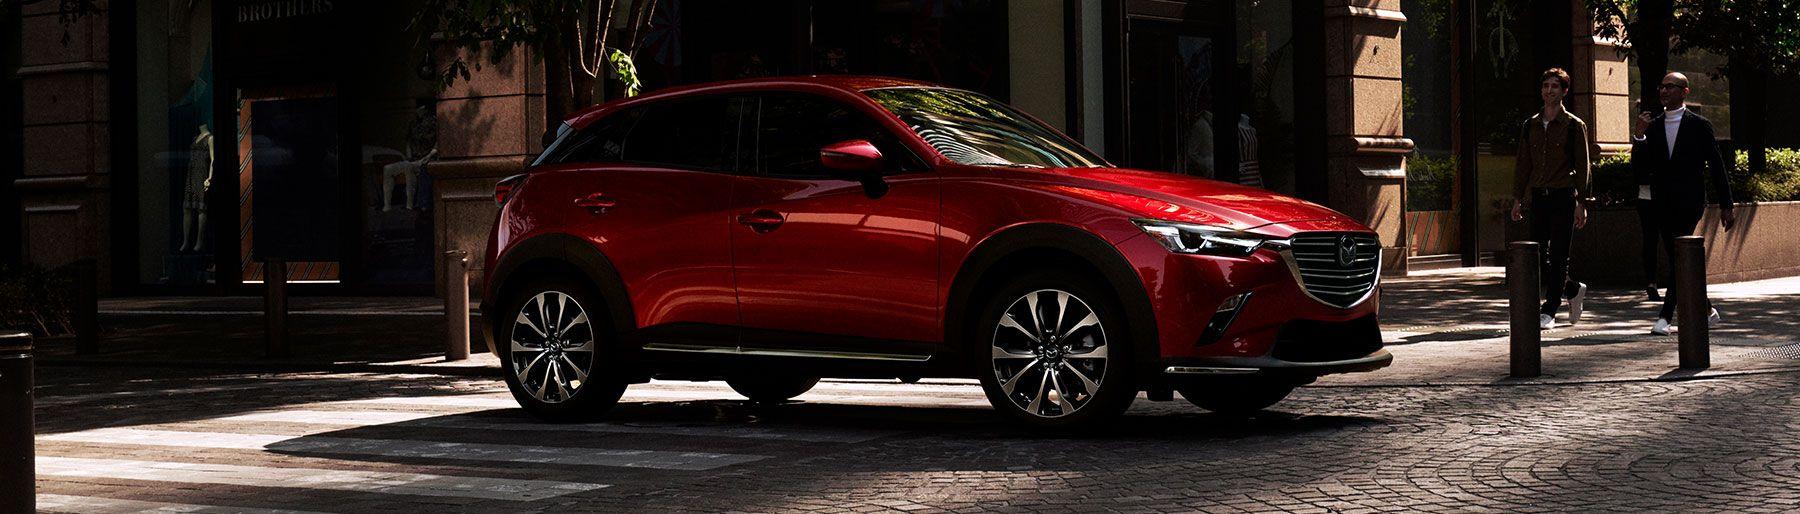 2019 Mazda CX-3 Financing in San Antonio, TX